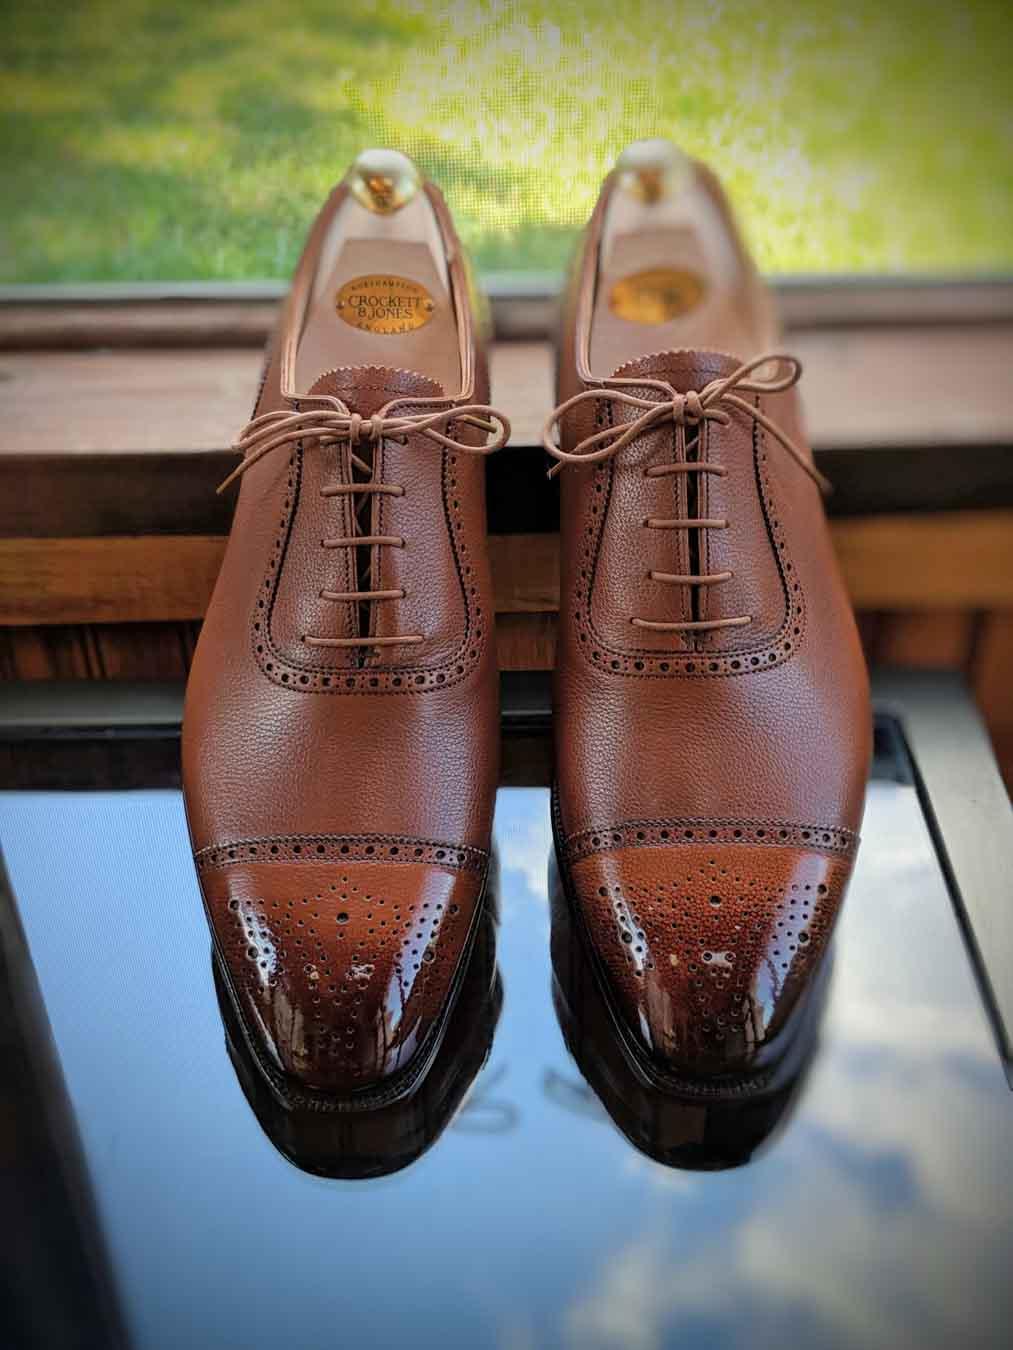 mbshoedoc shoe patina and shining